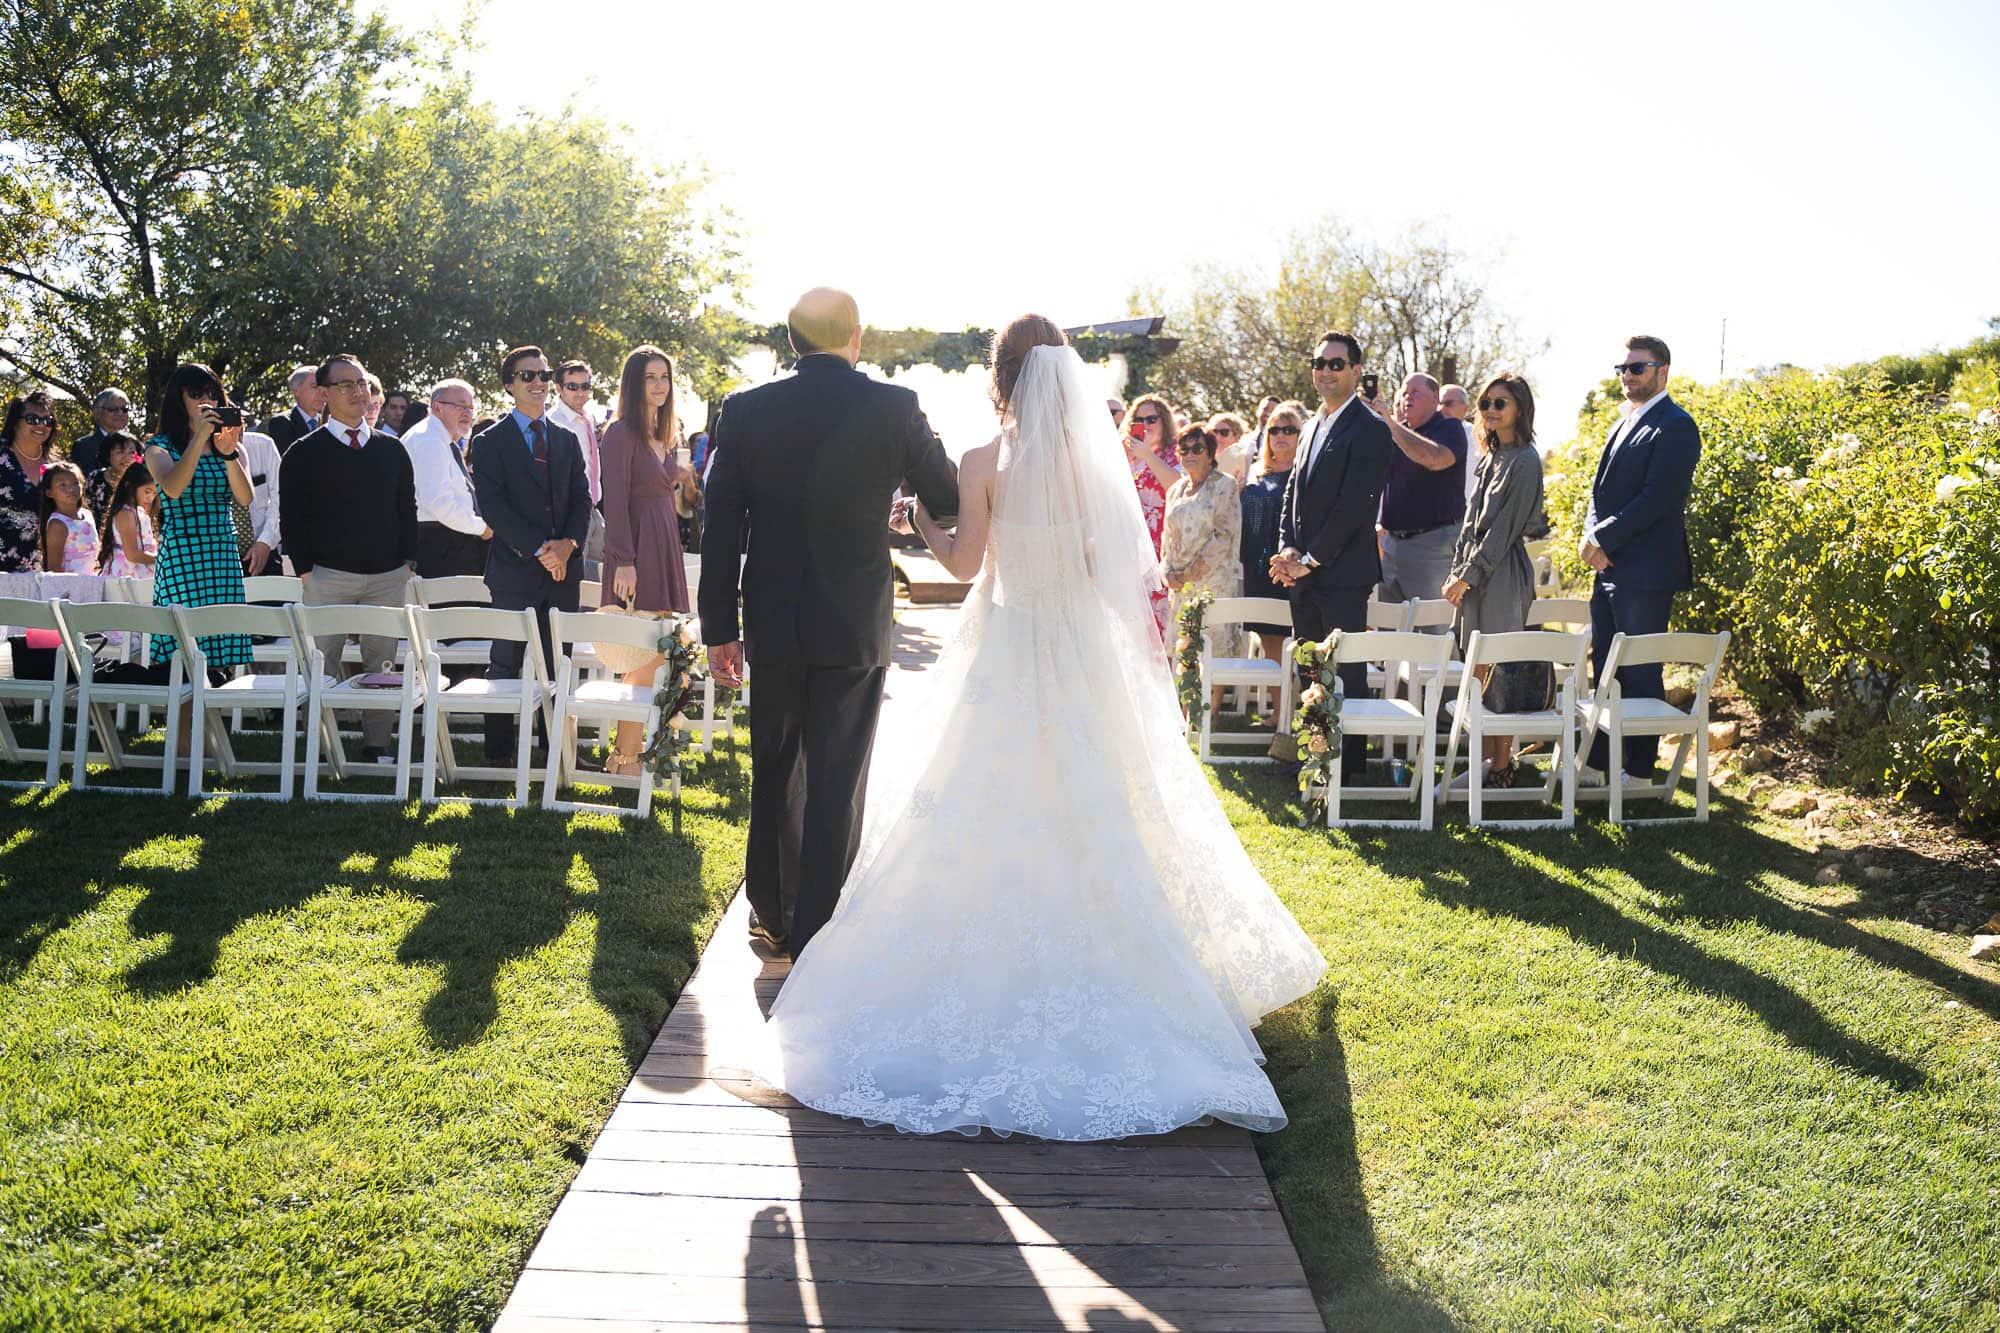 176_Alan_and_Heidi_Serendipity_Garden_Wedding_10-27-2018